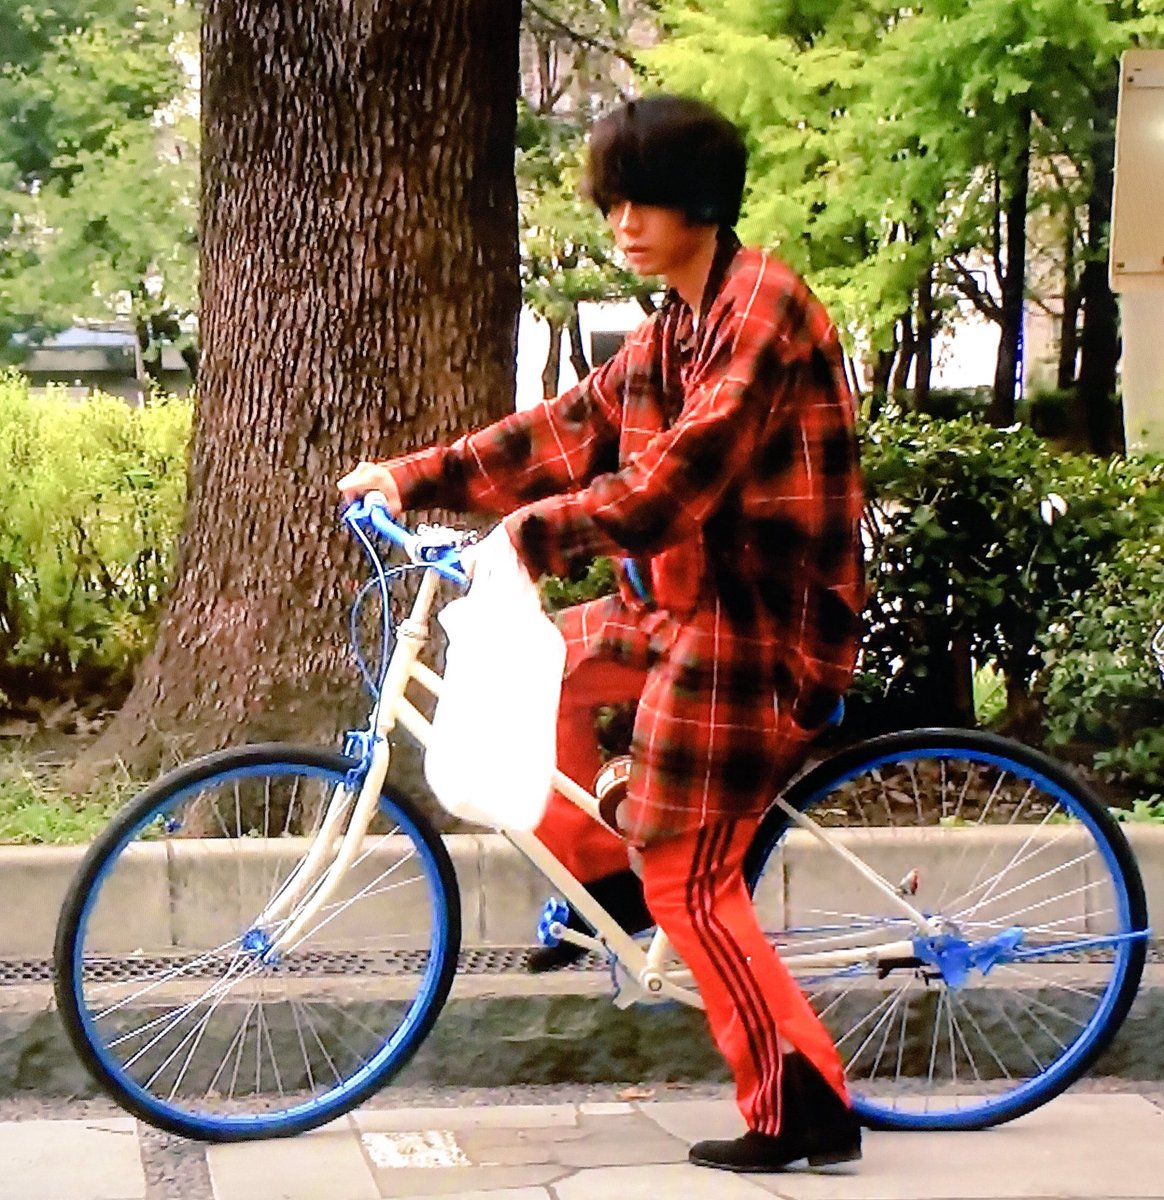 tweet  本田翼さんに菅田将暉さんも!主人公以外のファッションも大注目だった♡【校閲ガール】 , NAVER まとめ